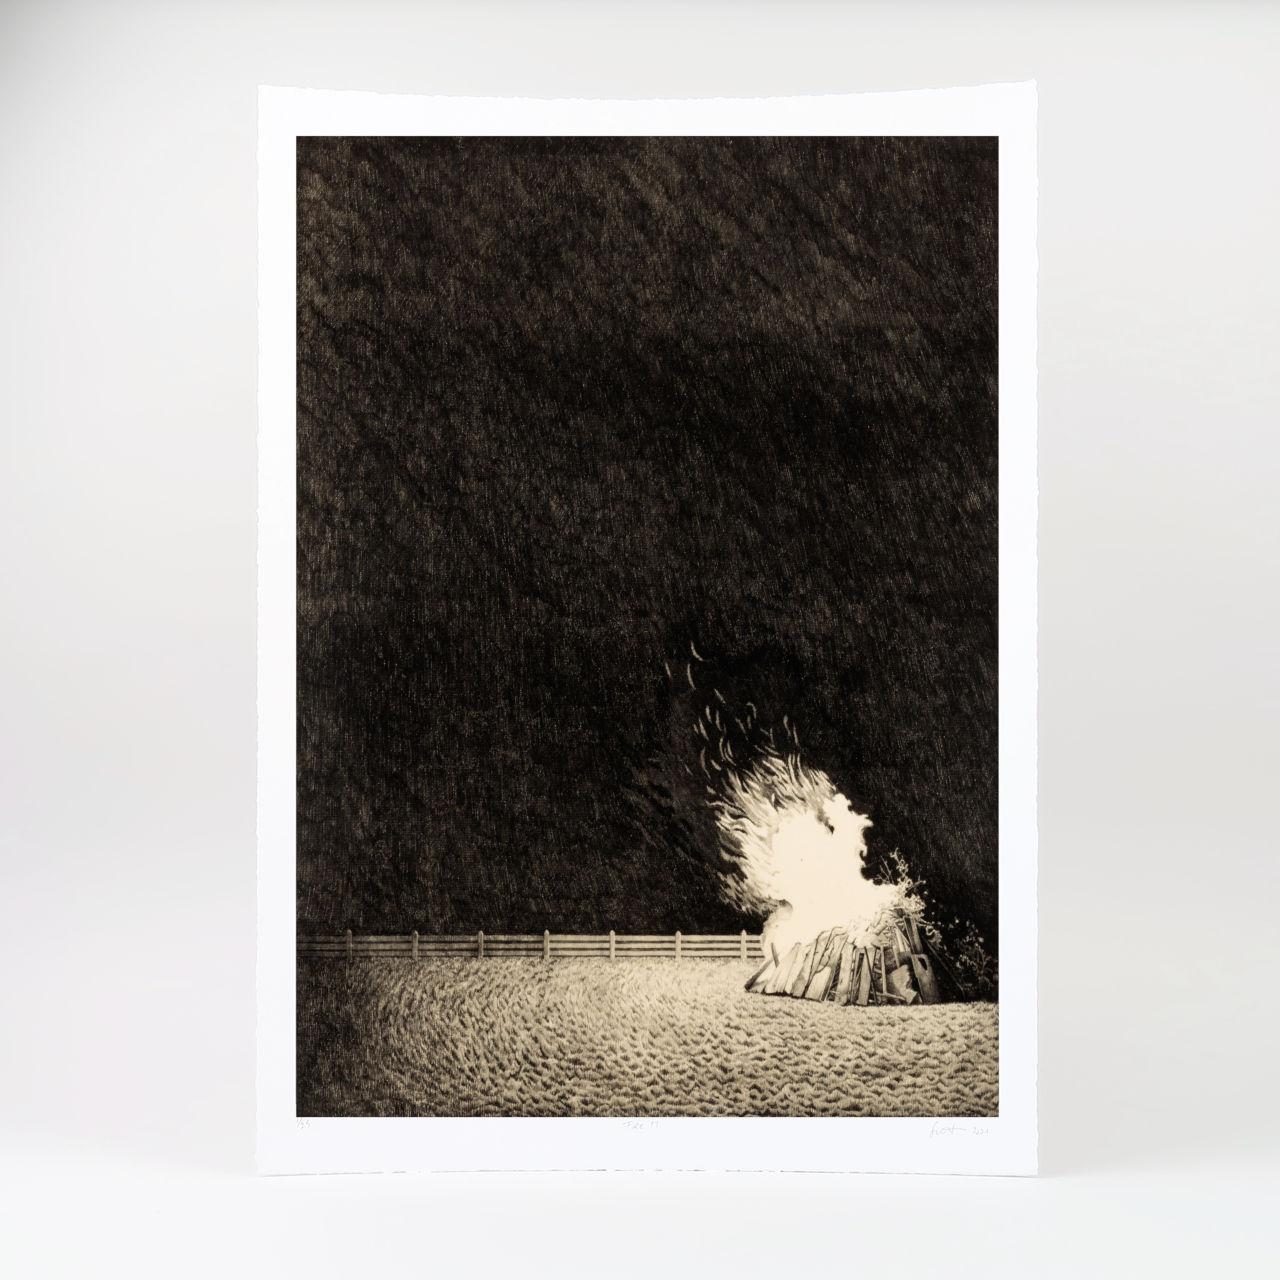 Limited Edition Giclée Print - Fire 11